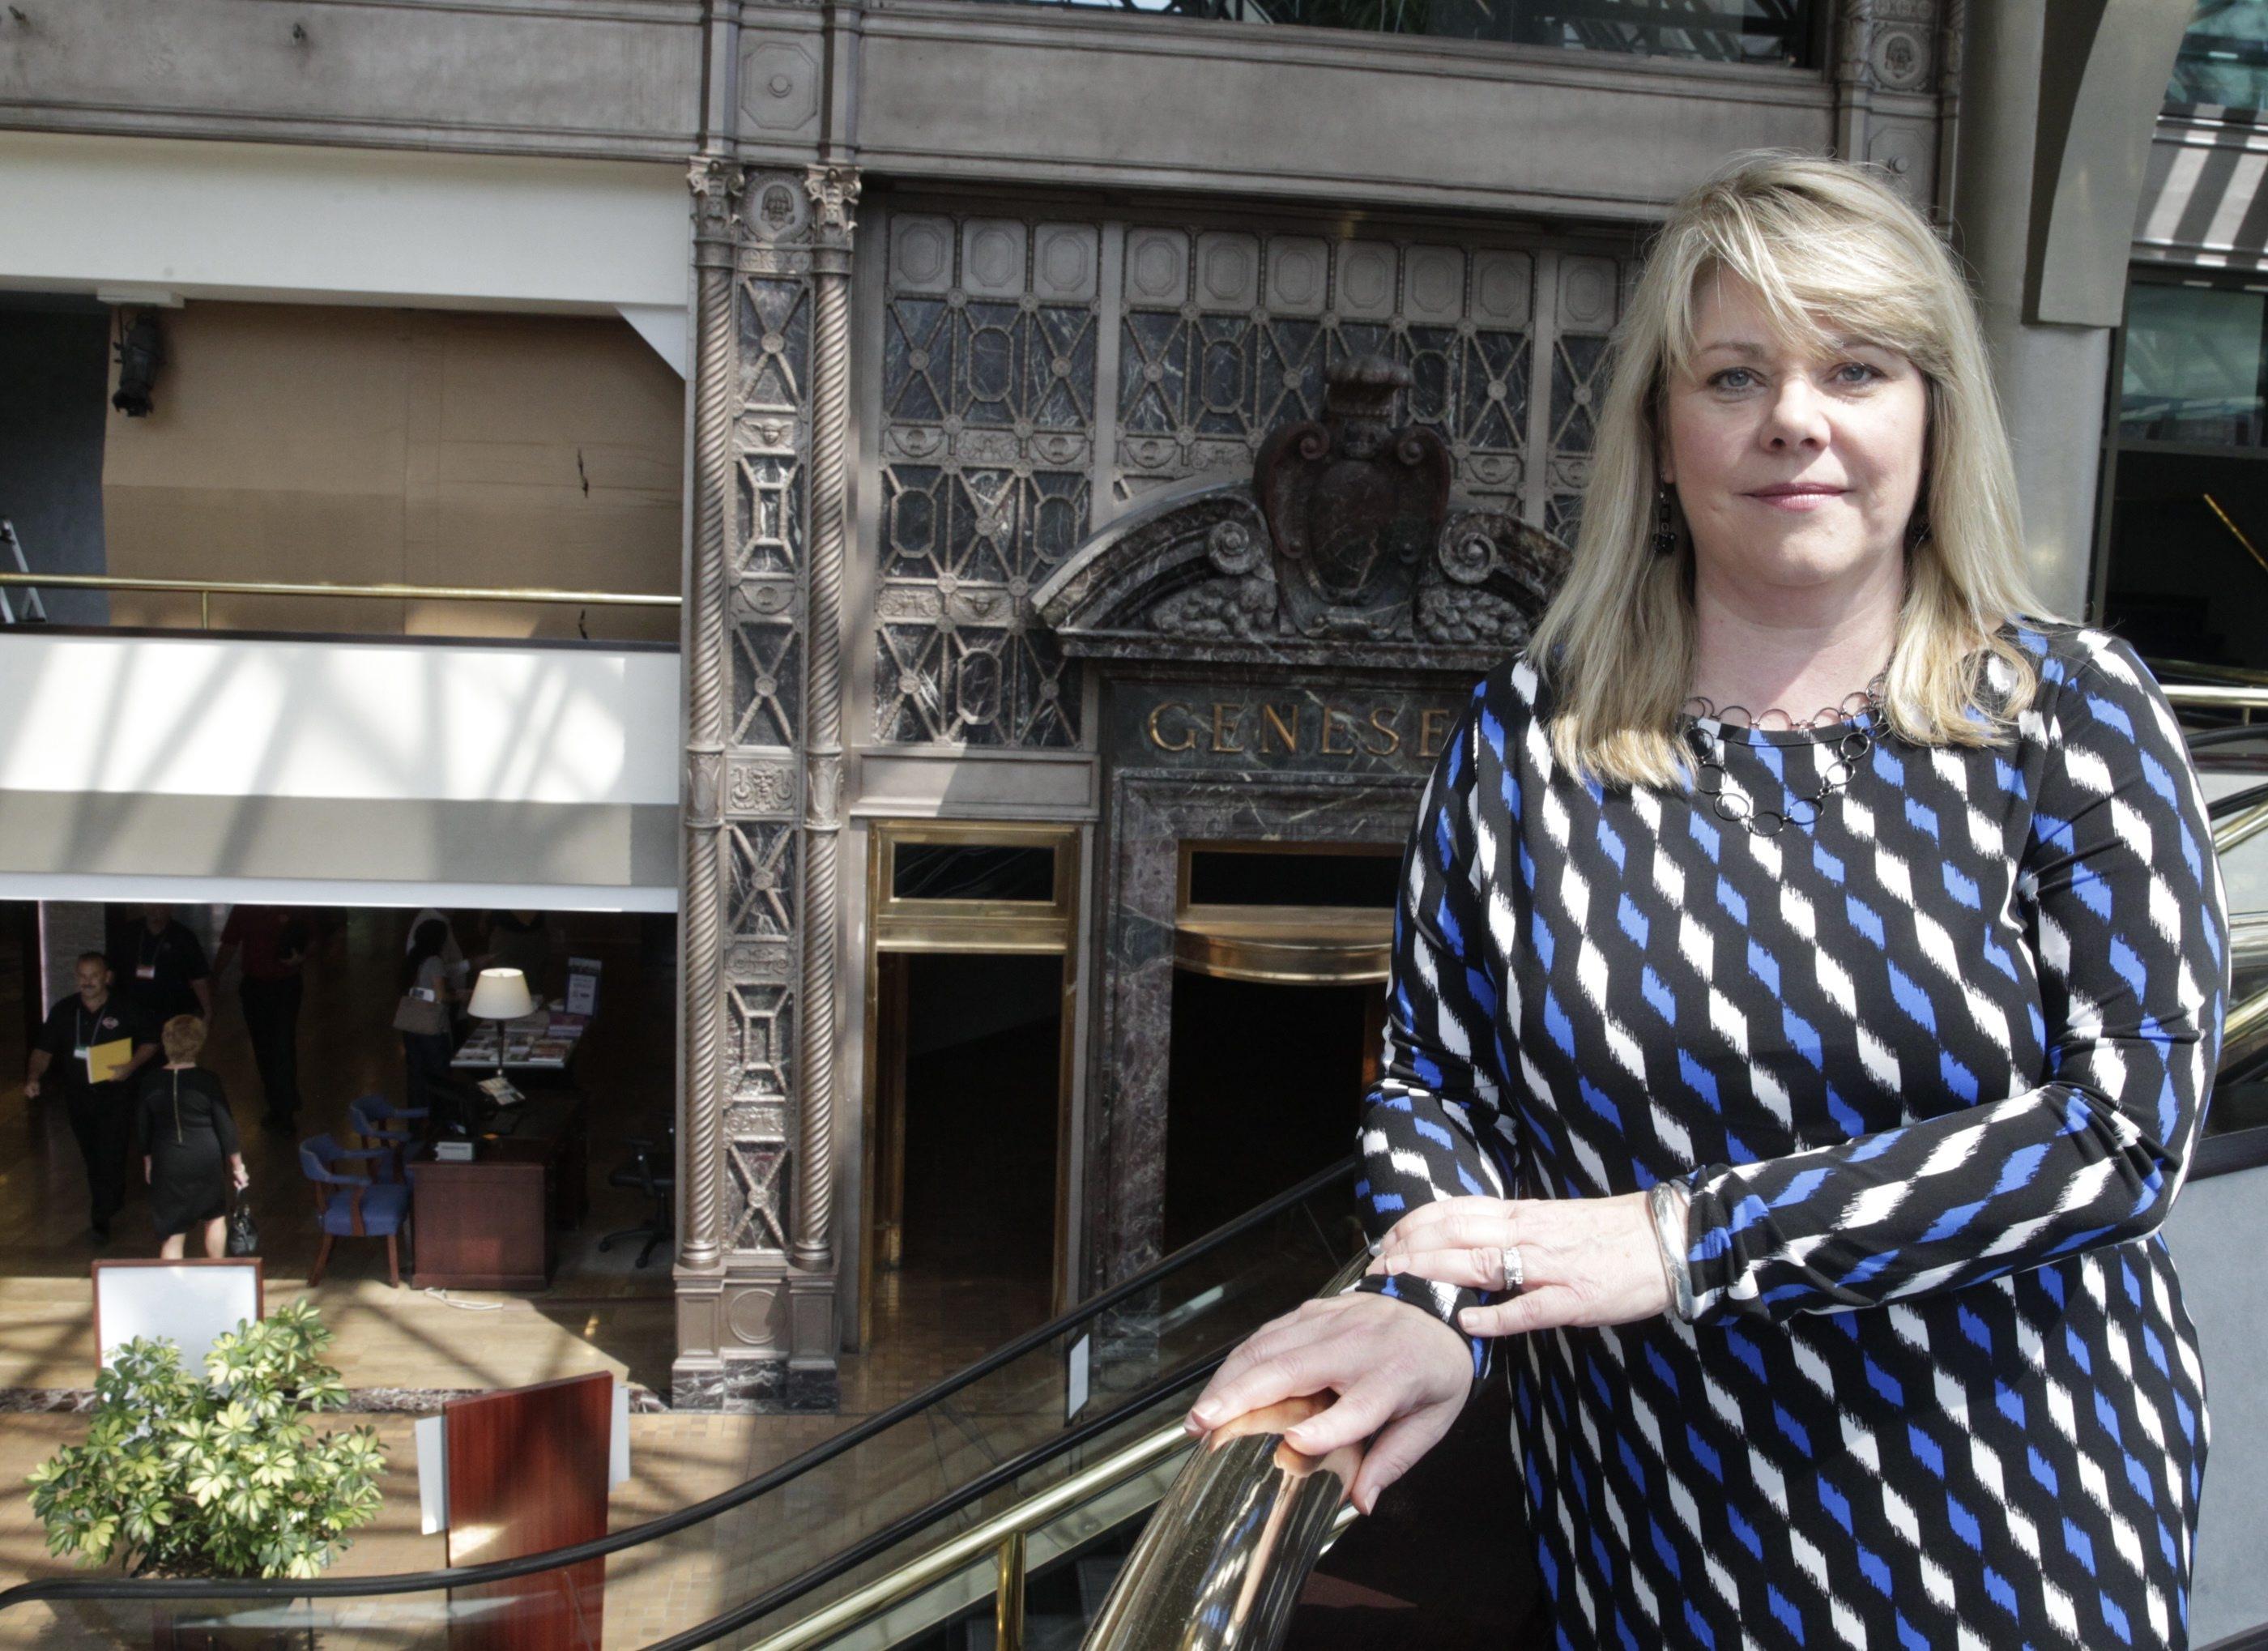 The Buffalo Niagara Partnership's President & CEO, Dottie Gallagher-Cohen at Hyatt Regency in Buffalo, N.Y., on Thursday, June 18, 2015 after a presentation by Solar City. (John Hickey/Buffalo News)